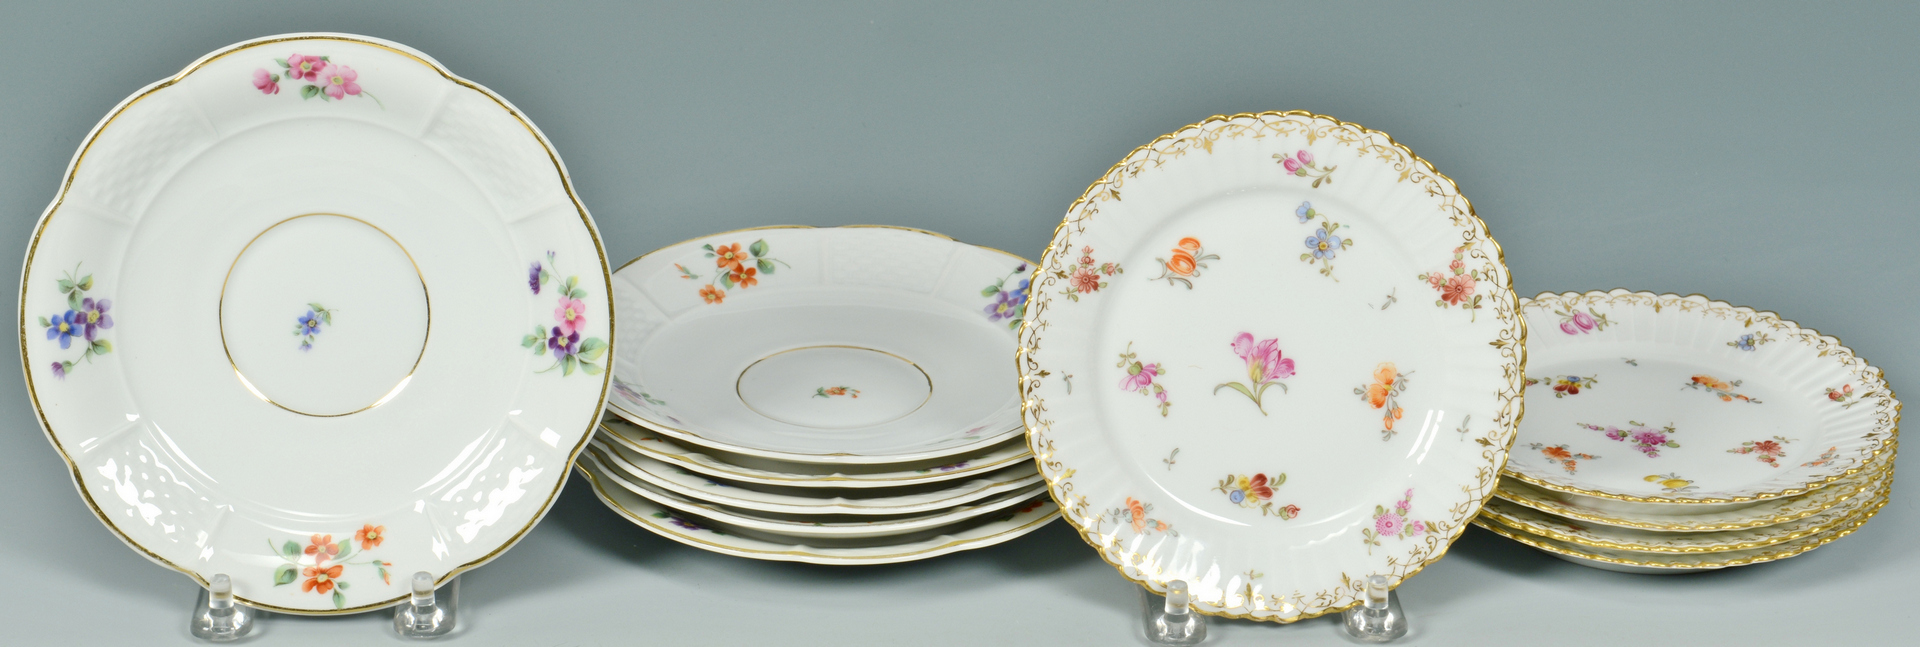 Lot 3088355: Rosenthal Dinnerware Service